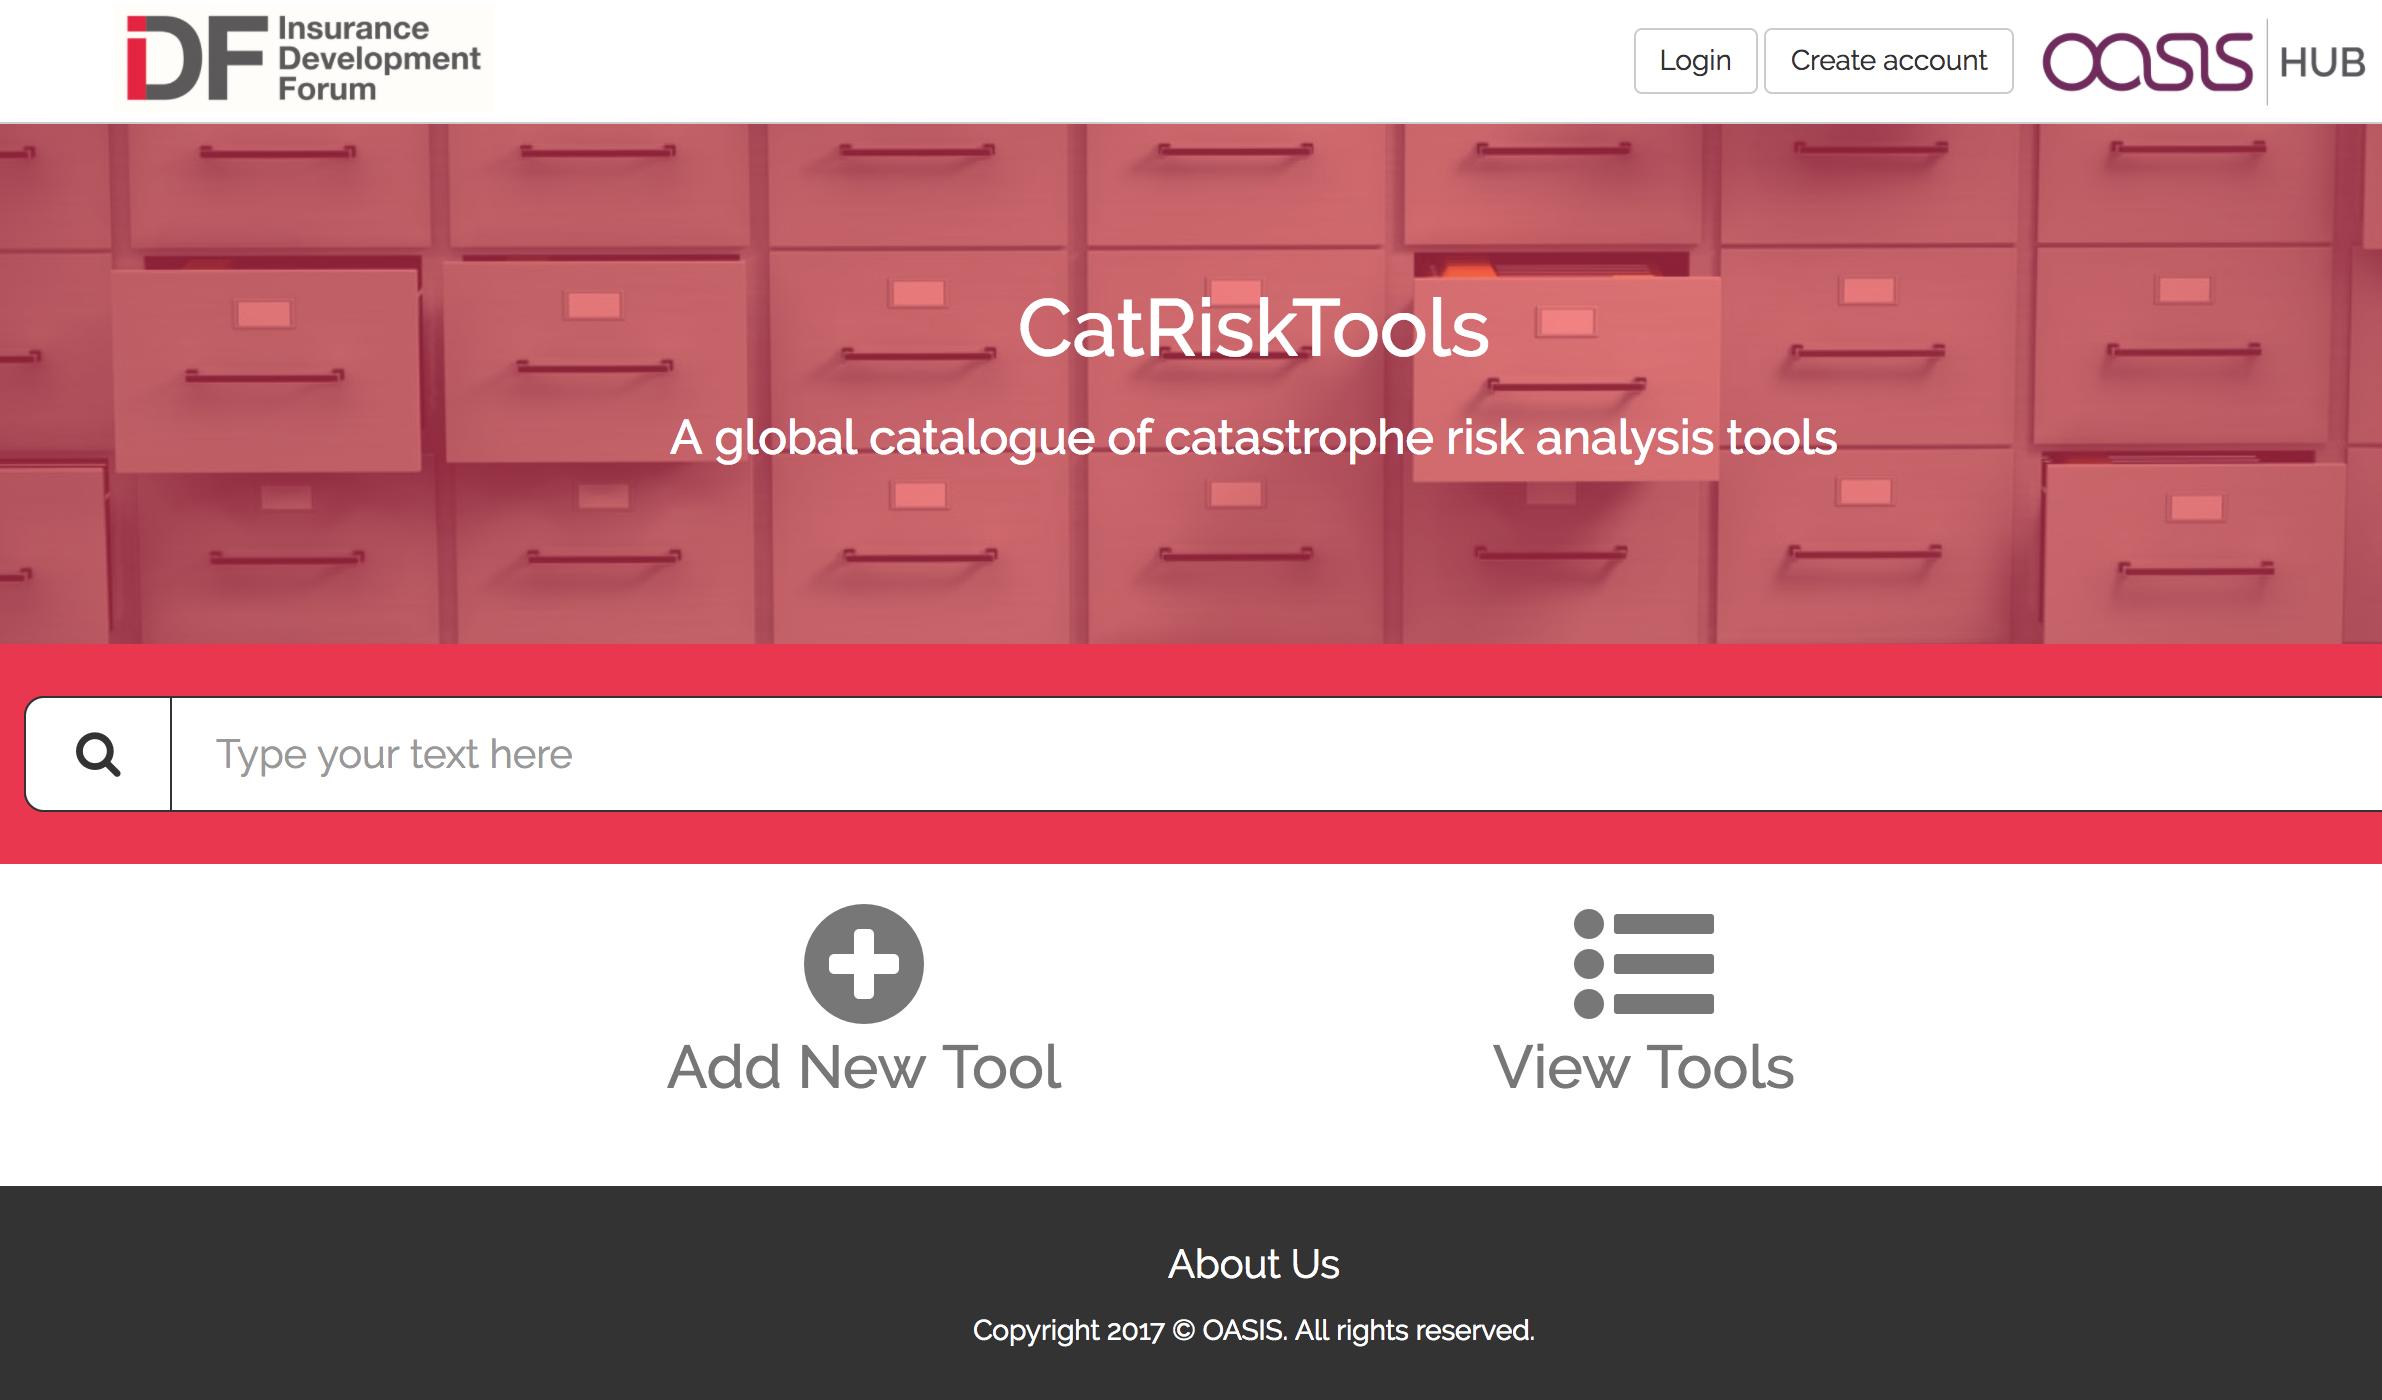 CatRiskTools